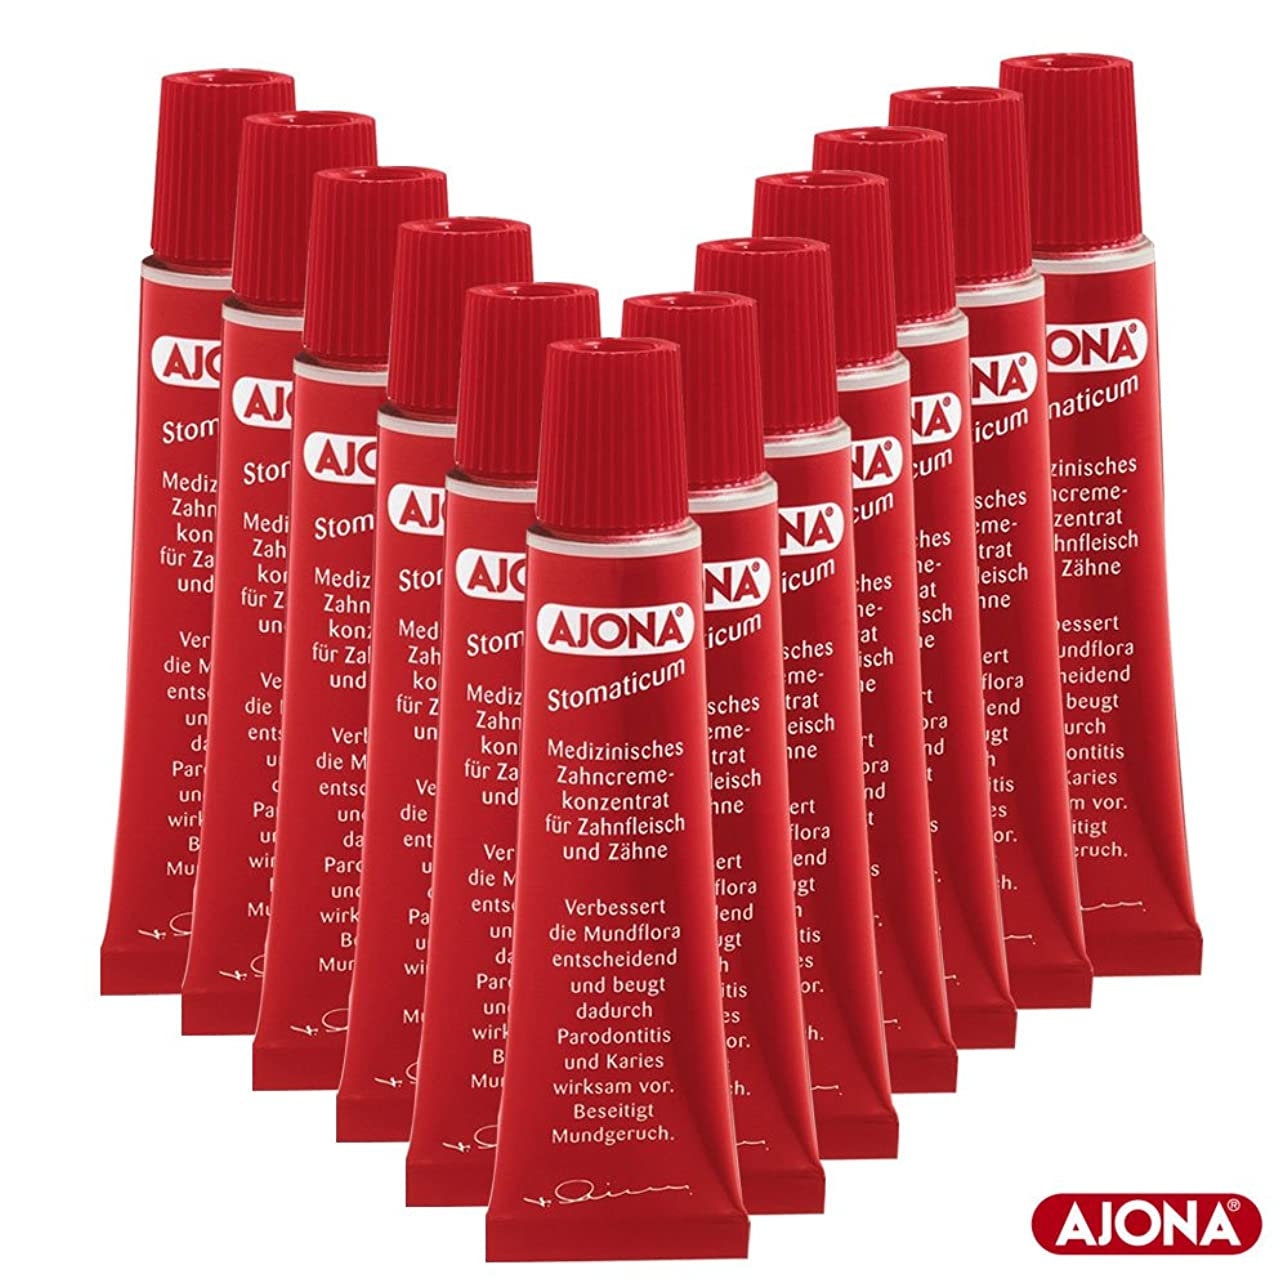 弾薬温度計補うAjona 濃縮歯磨き粉 Stomaticum Toothpaste 25ml(12x 25ml)-12Pack [並行輸入品]